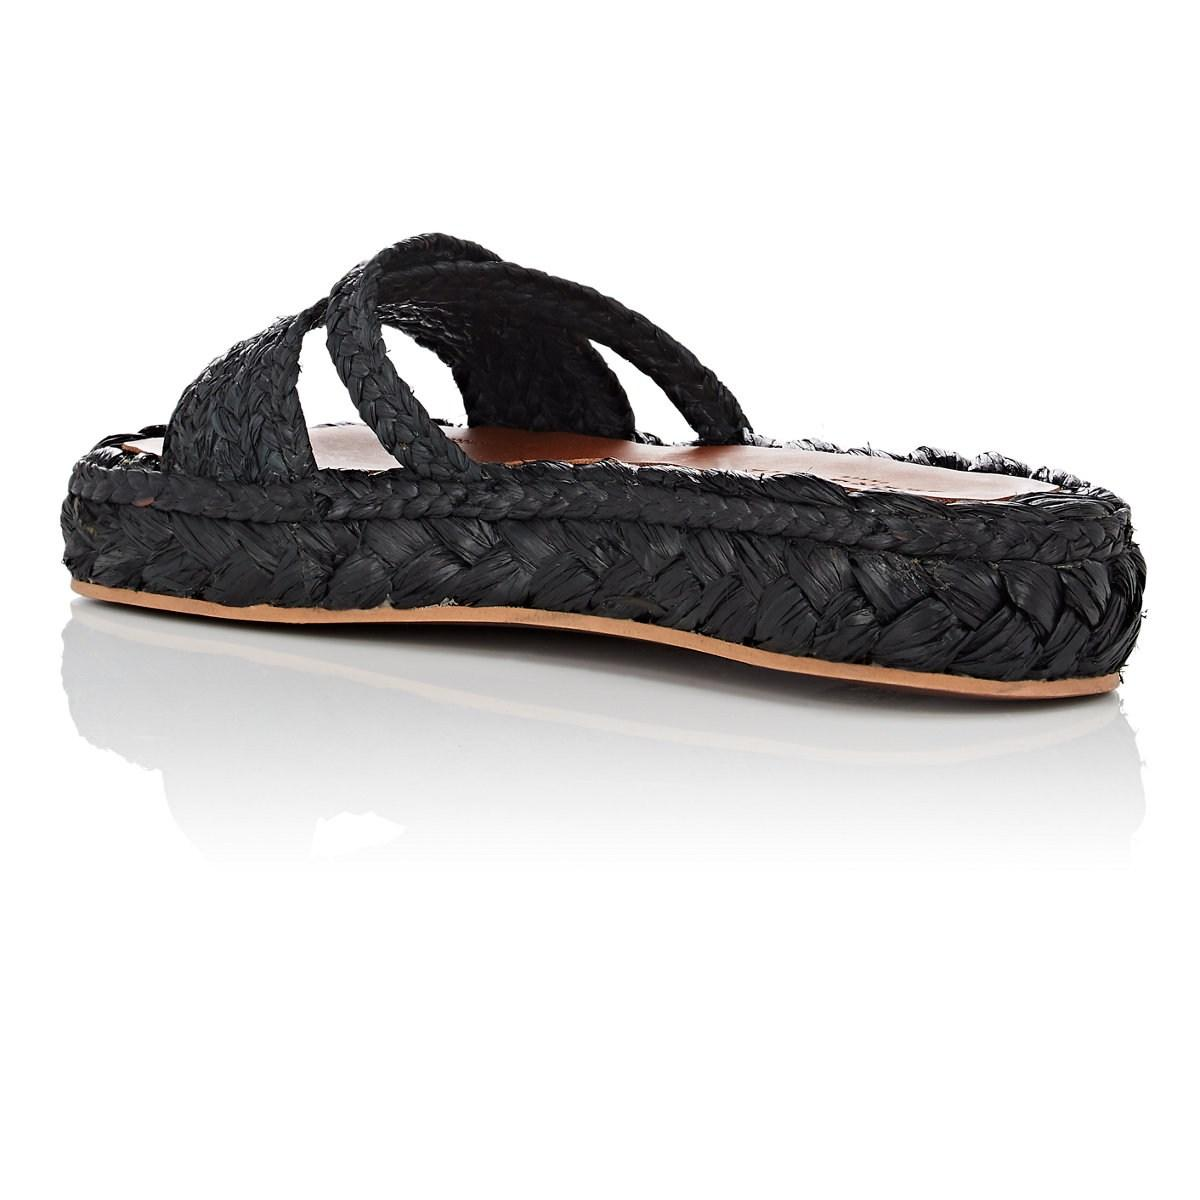 04744d106f4 Clergerie - Black Idalie Raffia Sandals - Lyst. View fullscreen